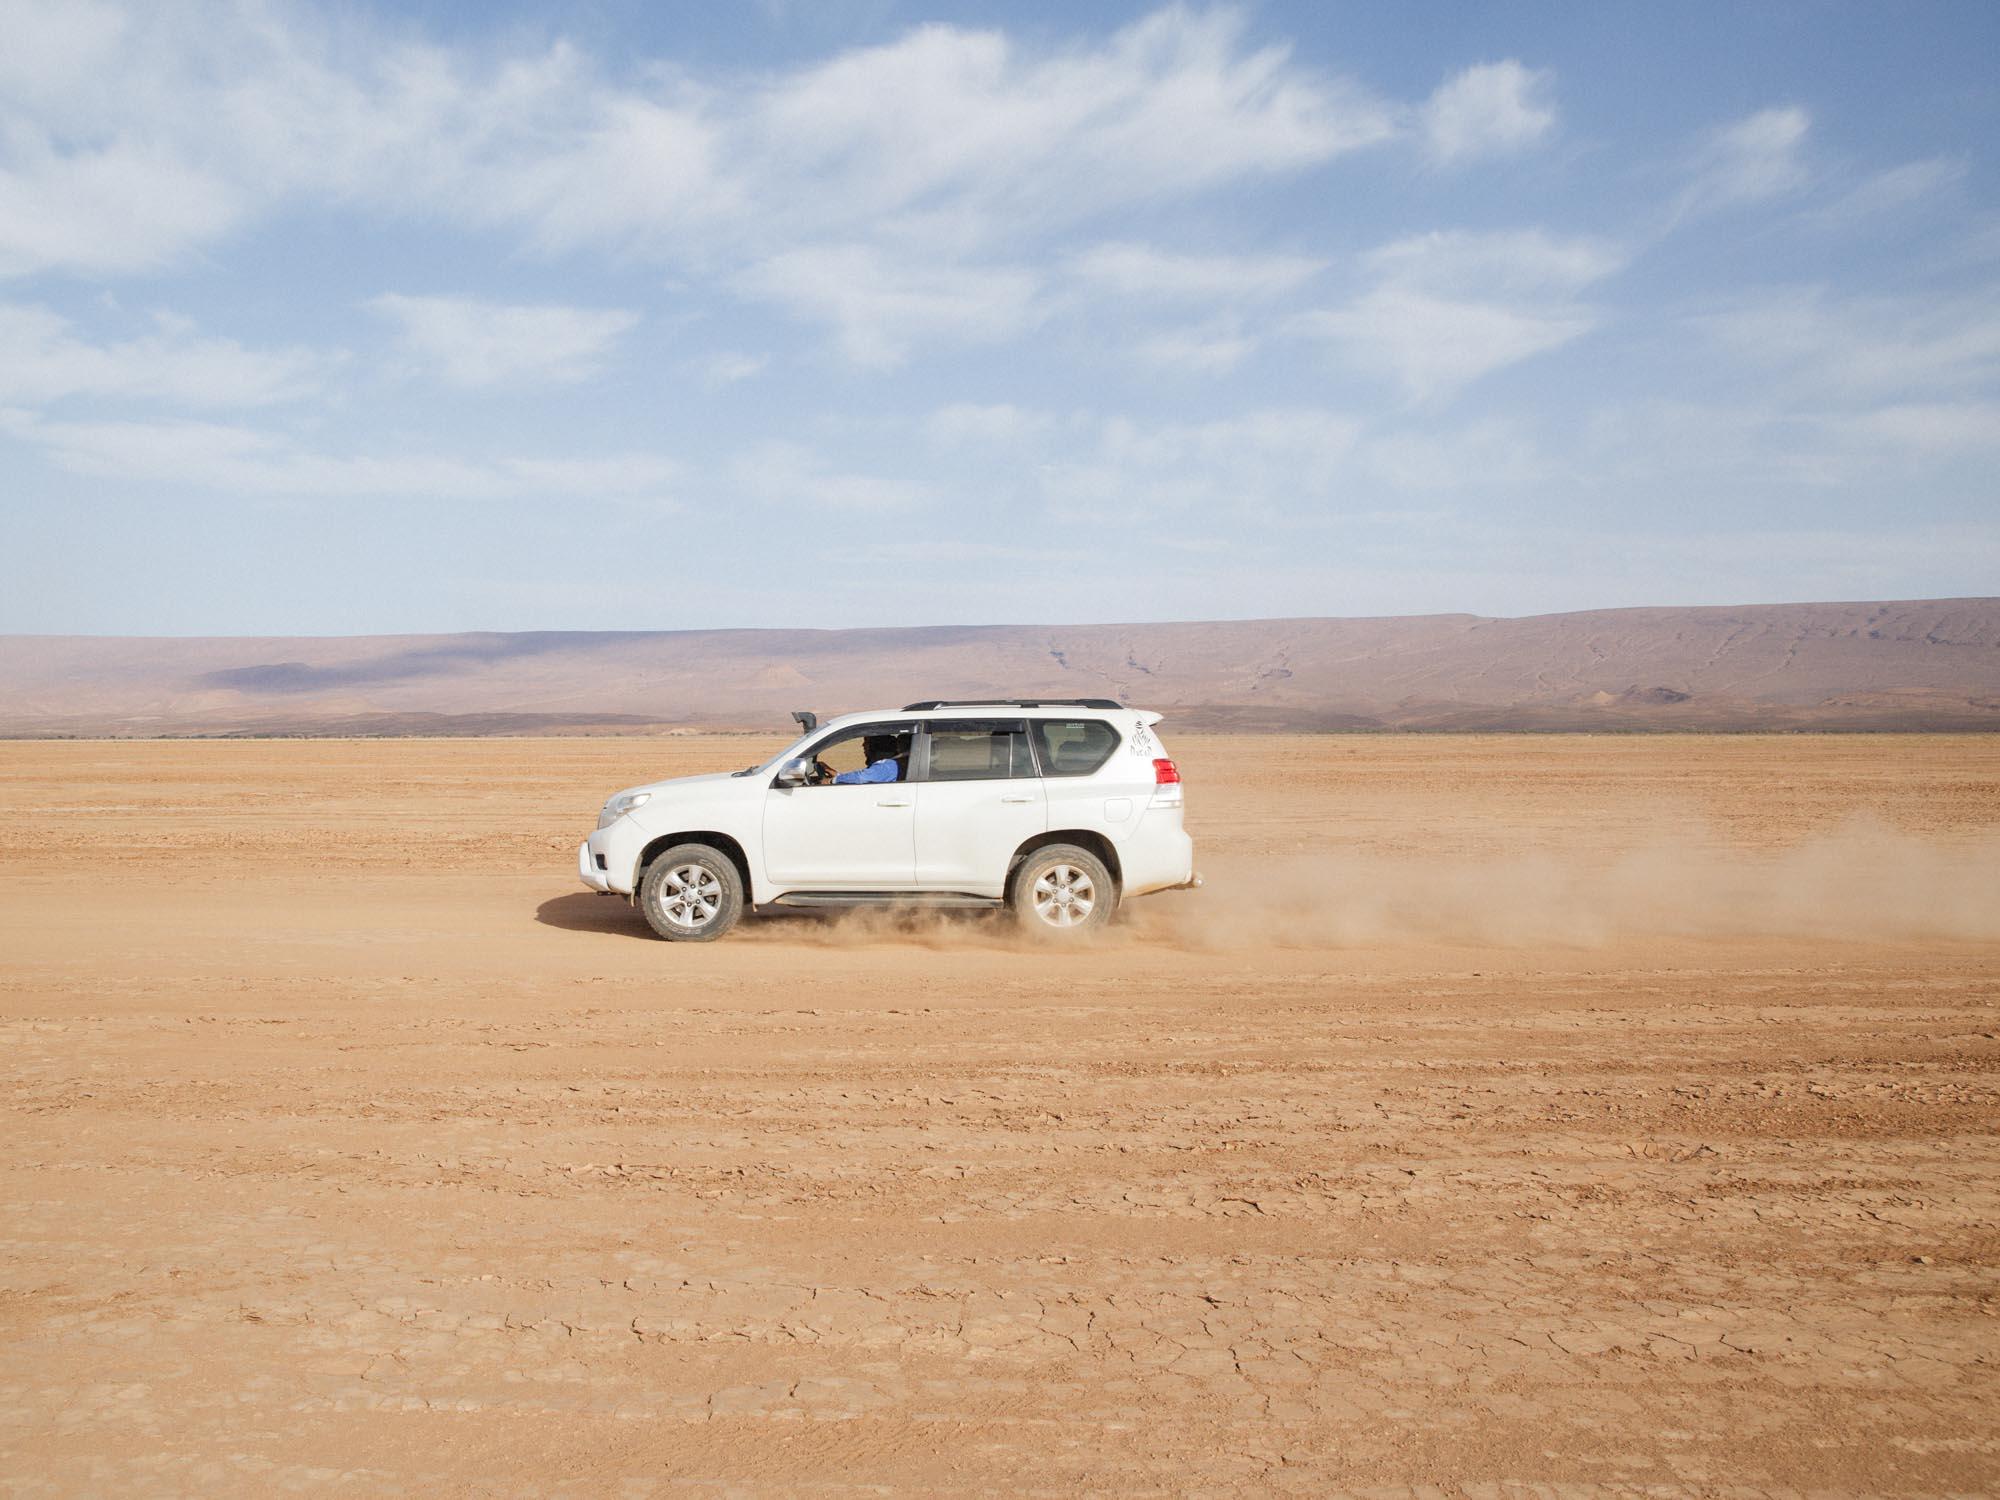 Luxury 4x4 Transport at Desert Camp Morocco